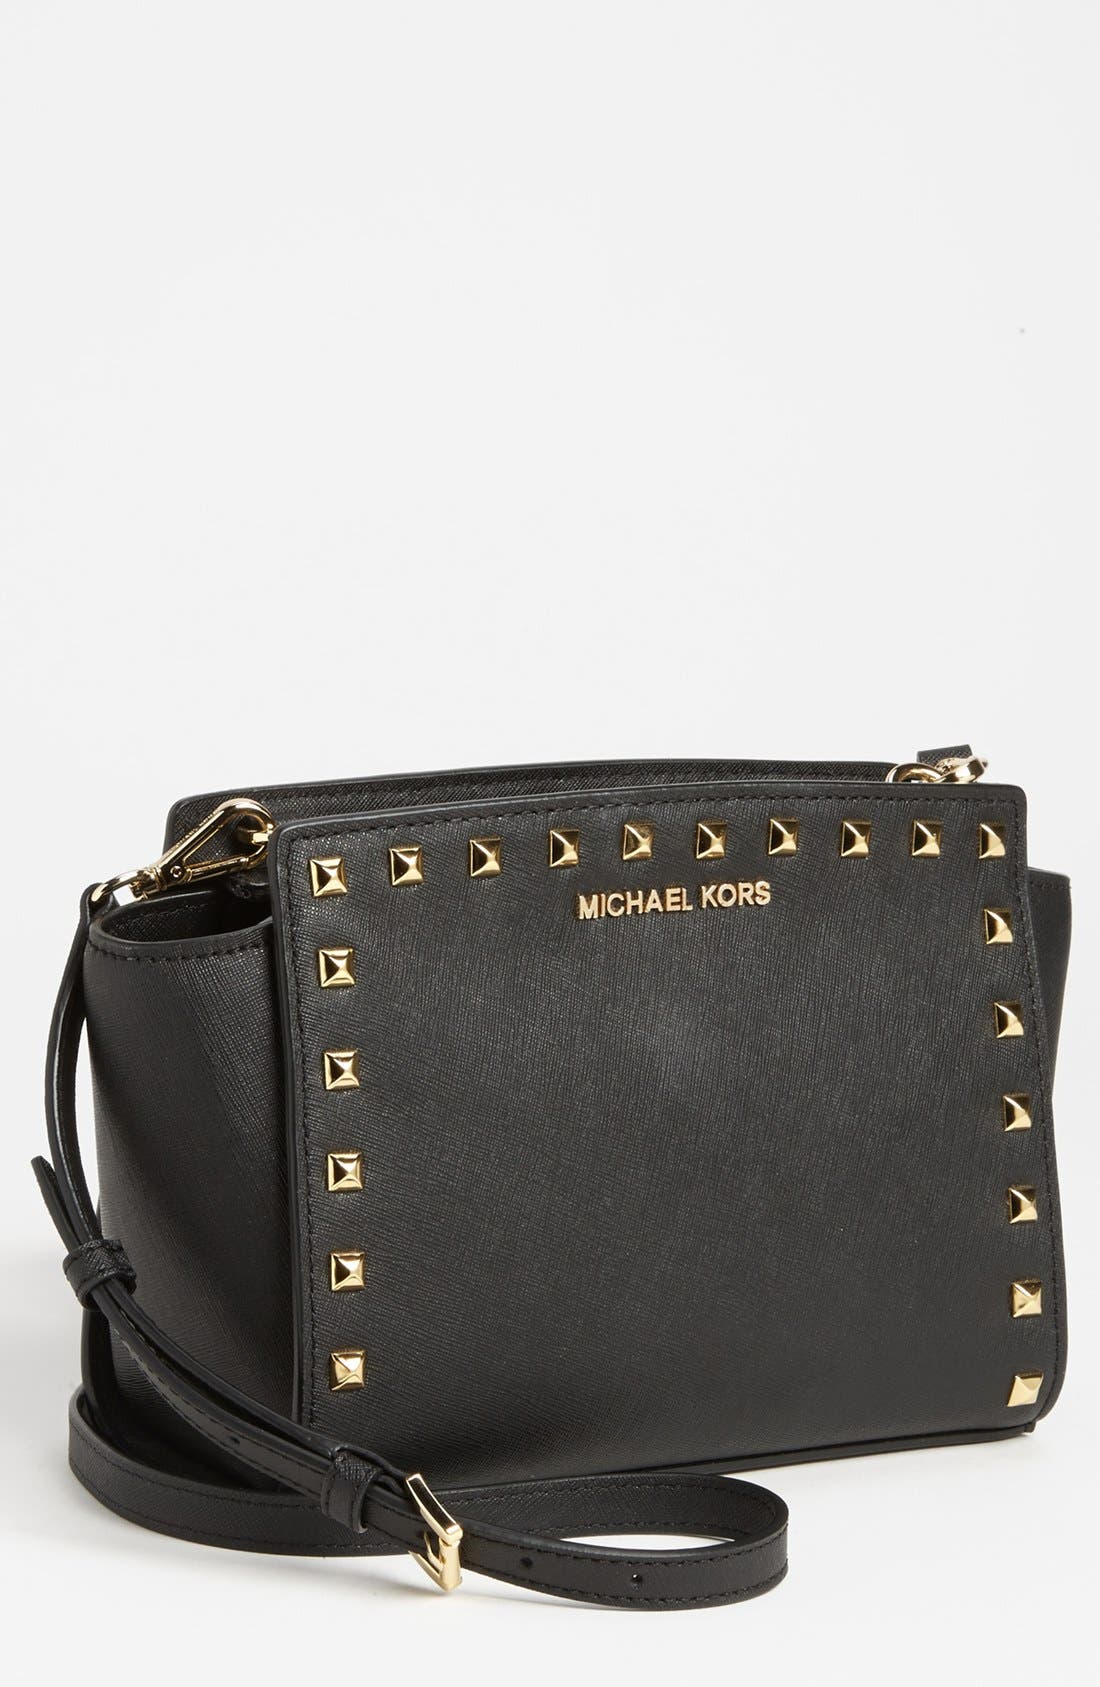 'Selma - Stud' Saffiano Leather Crossbody Bag,                             Main thumbnail 1, color,                             001